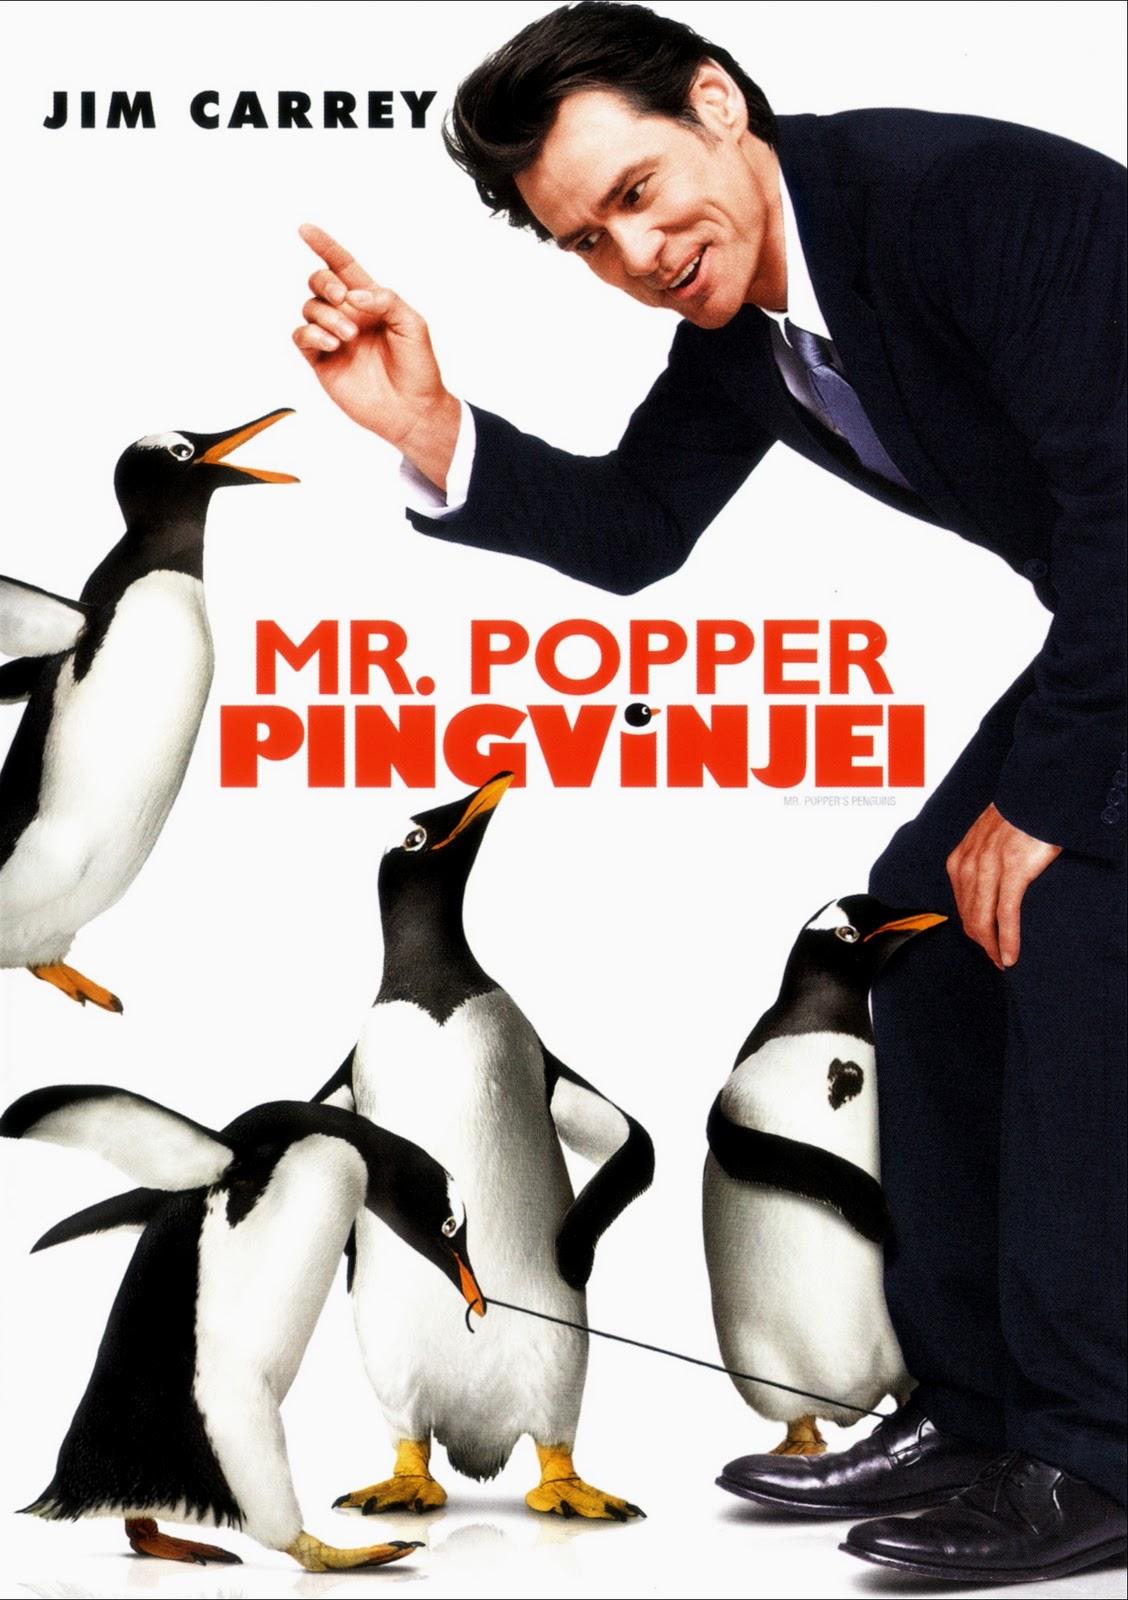 http://4.bp.blogspot.com/-mARQ1a3Rpzg/Tw11WD4klRI/AAAAAAAAA-8/sPzyaDT81nE/s1600/Mr.+Popper+pingvinjei.jpg